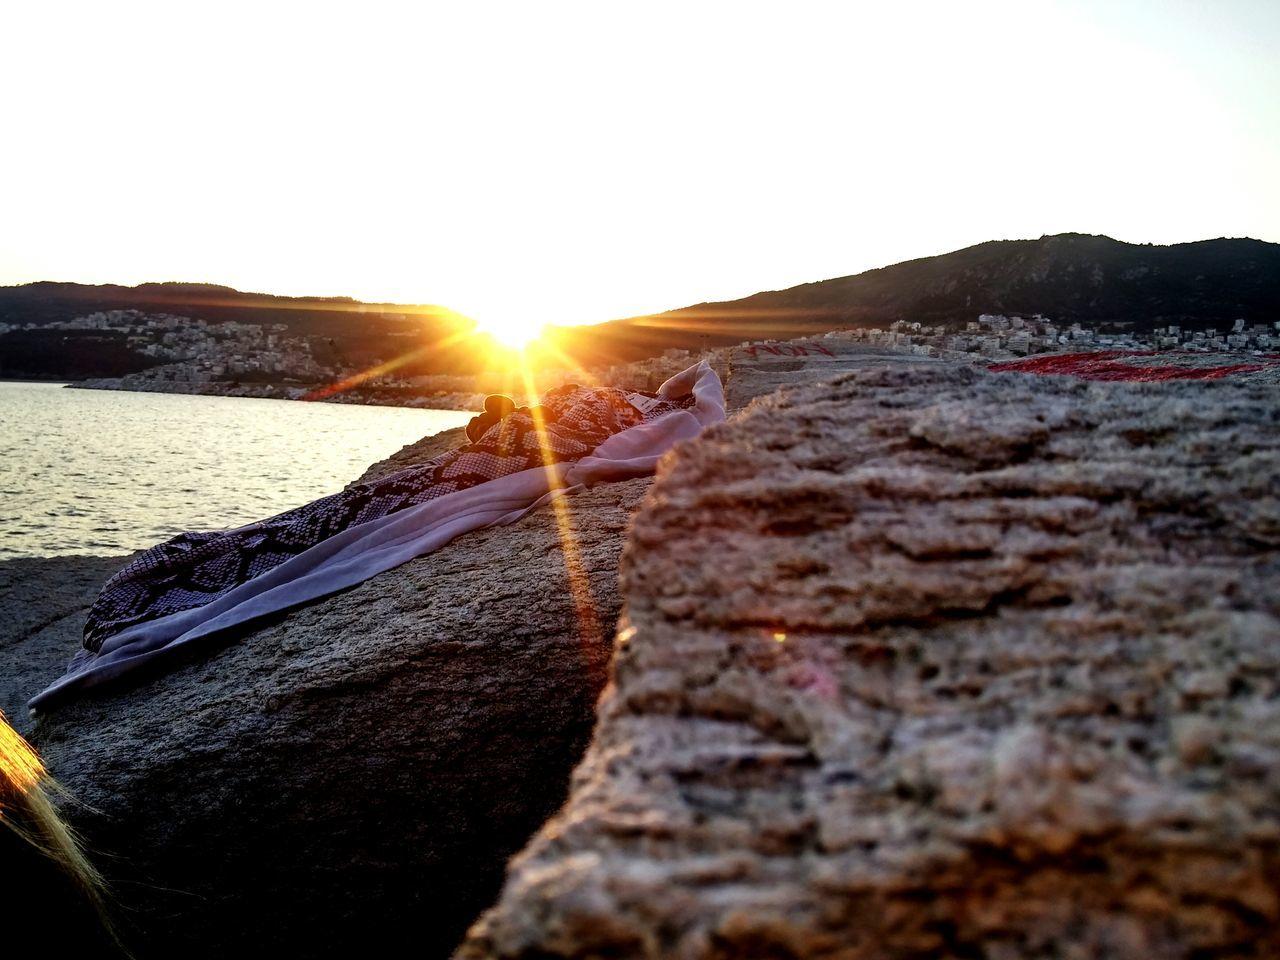 Sunset_collection Sunsetporn Sunsetsky Kavala Greece Kavalacity Lovegreece GREECE ♥♥ Hellas Sunsetviews Sunsetview👌👌👌 Sunsetview